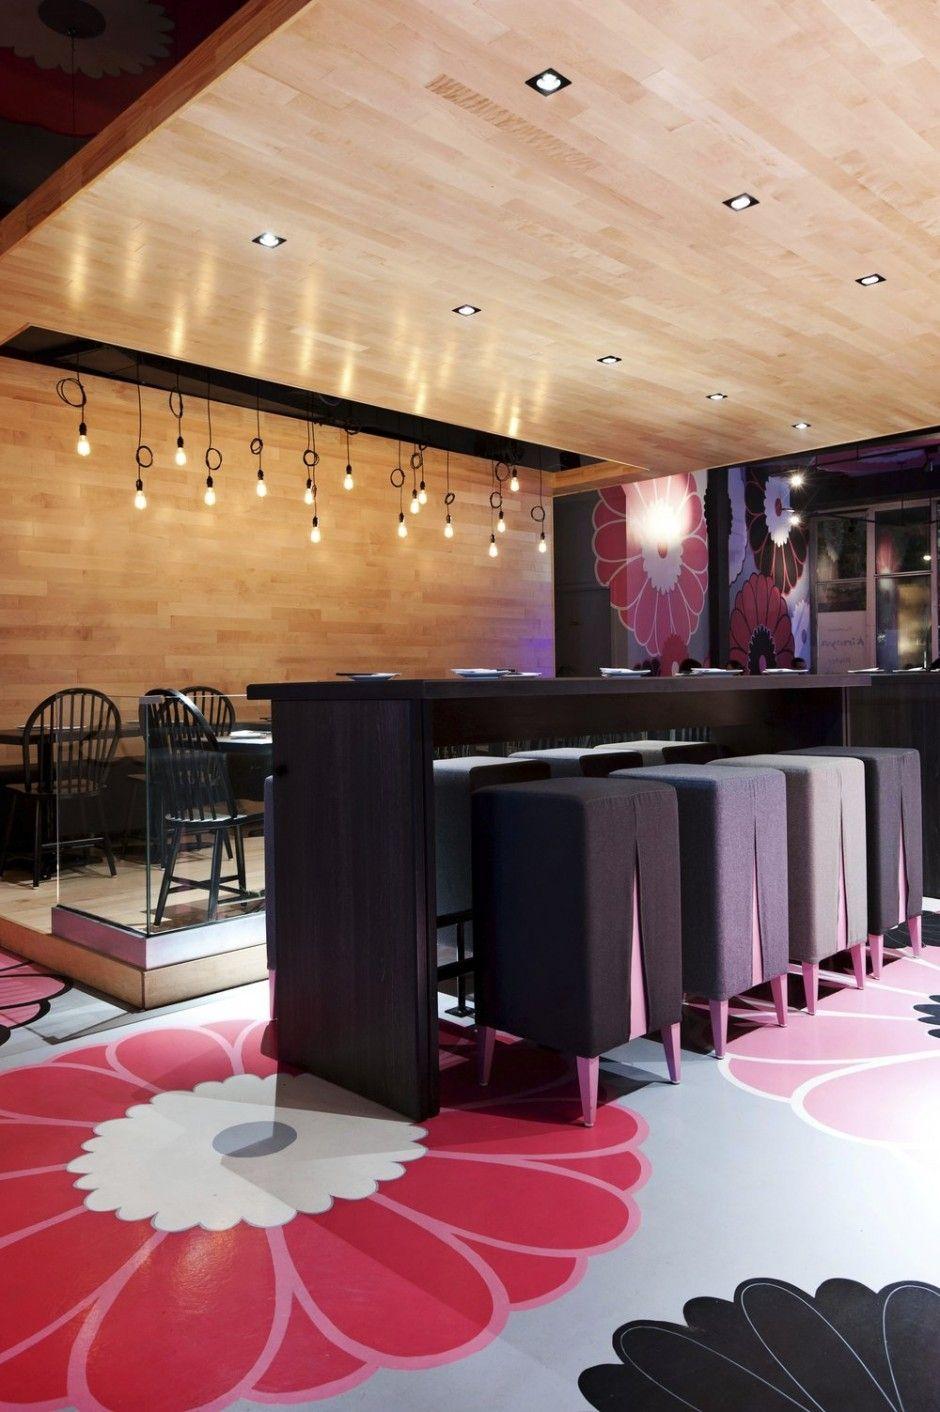 High Quality Kinoya Japanese Bistro Design By Jean De Lessard   Architecture U0026 Interior  Design Ideas And Online